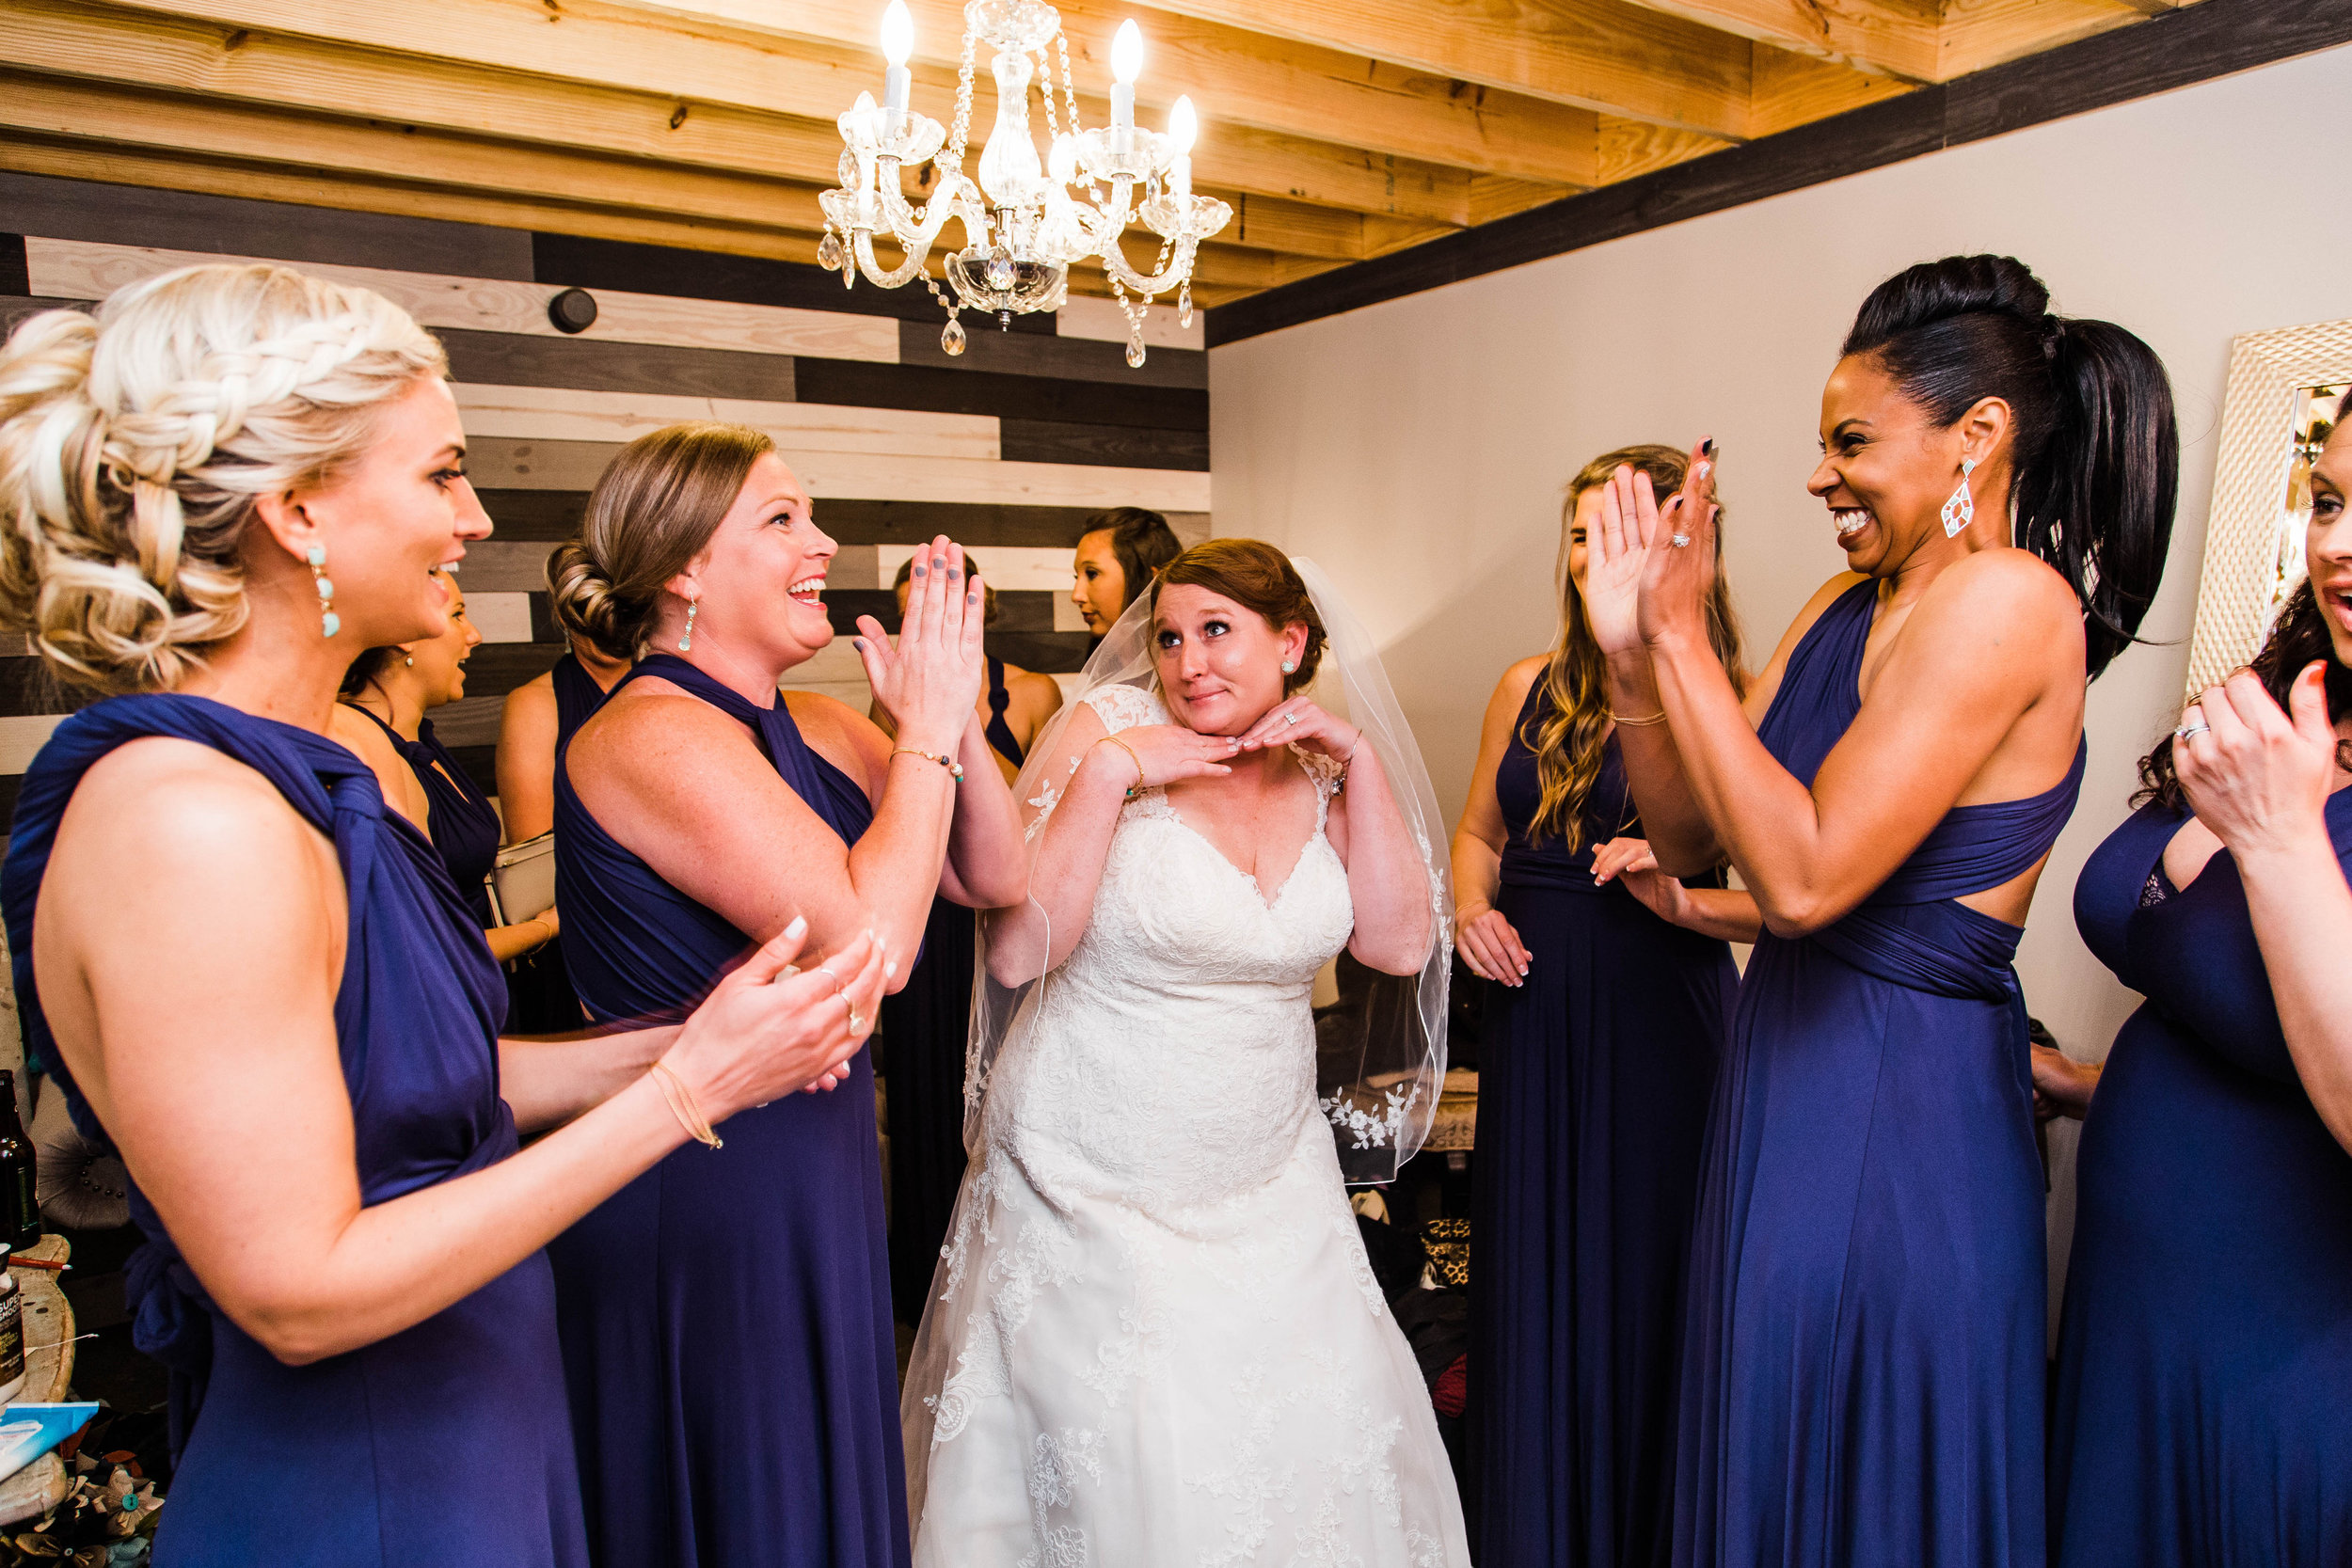 Honeysuckle-Hill-Weddings-Andrew-Rachel-170.jpg